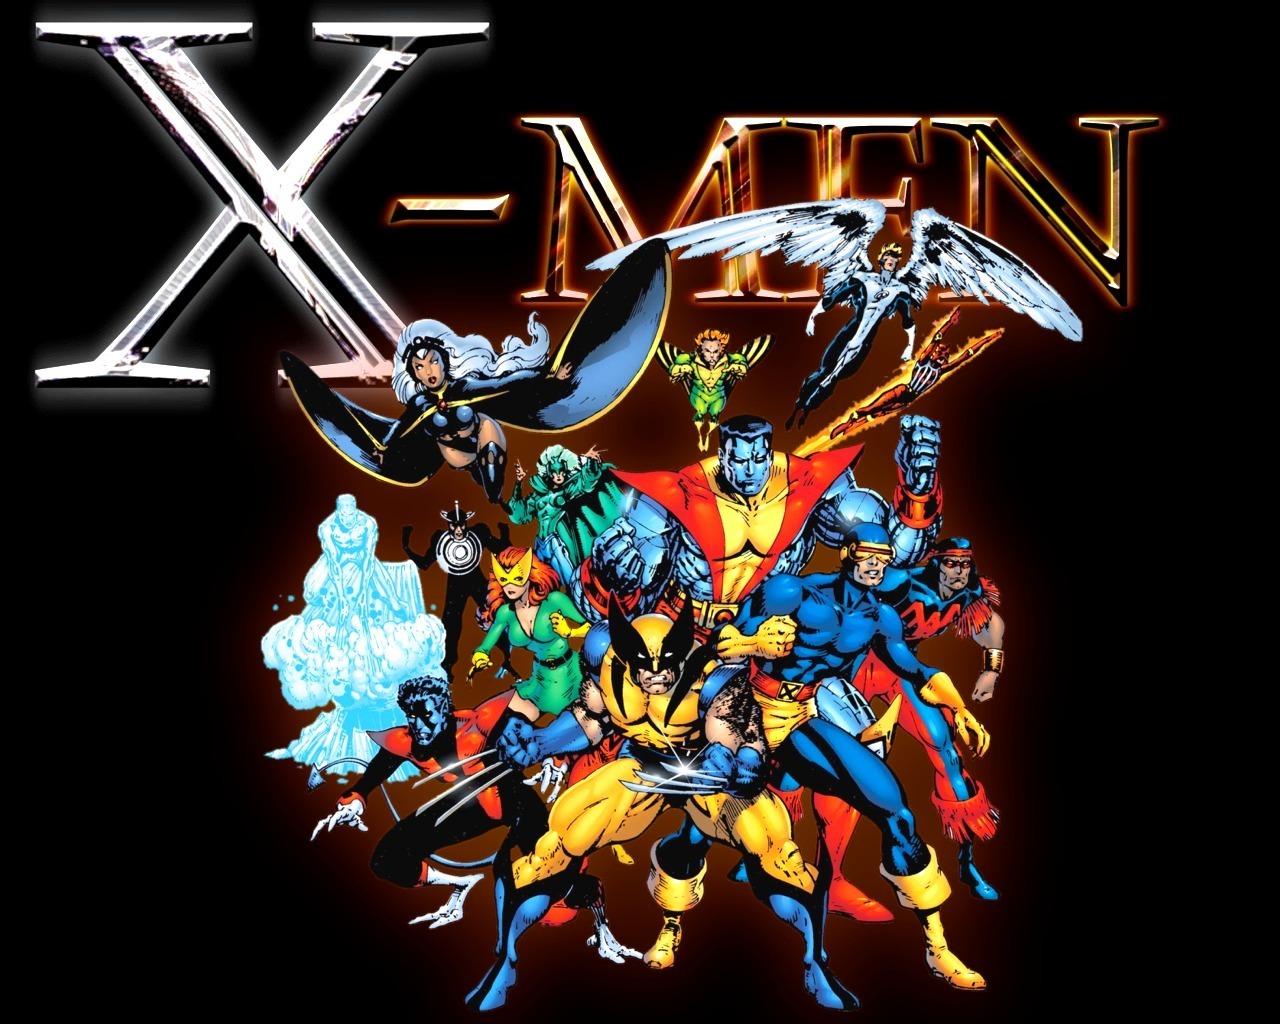 men   X Men Wallpaper 7050808 1280x1024